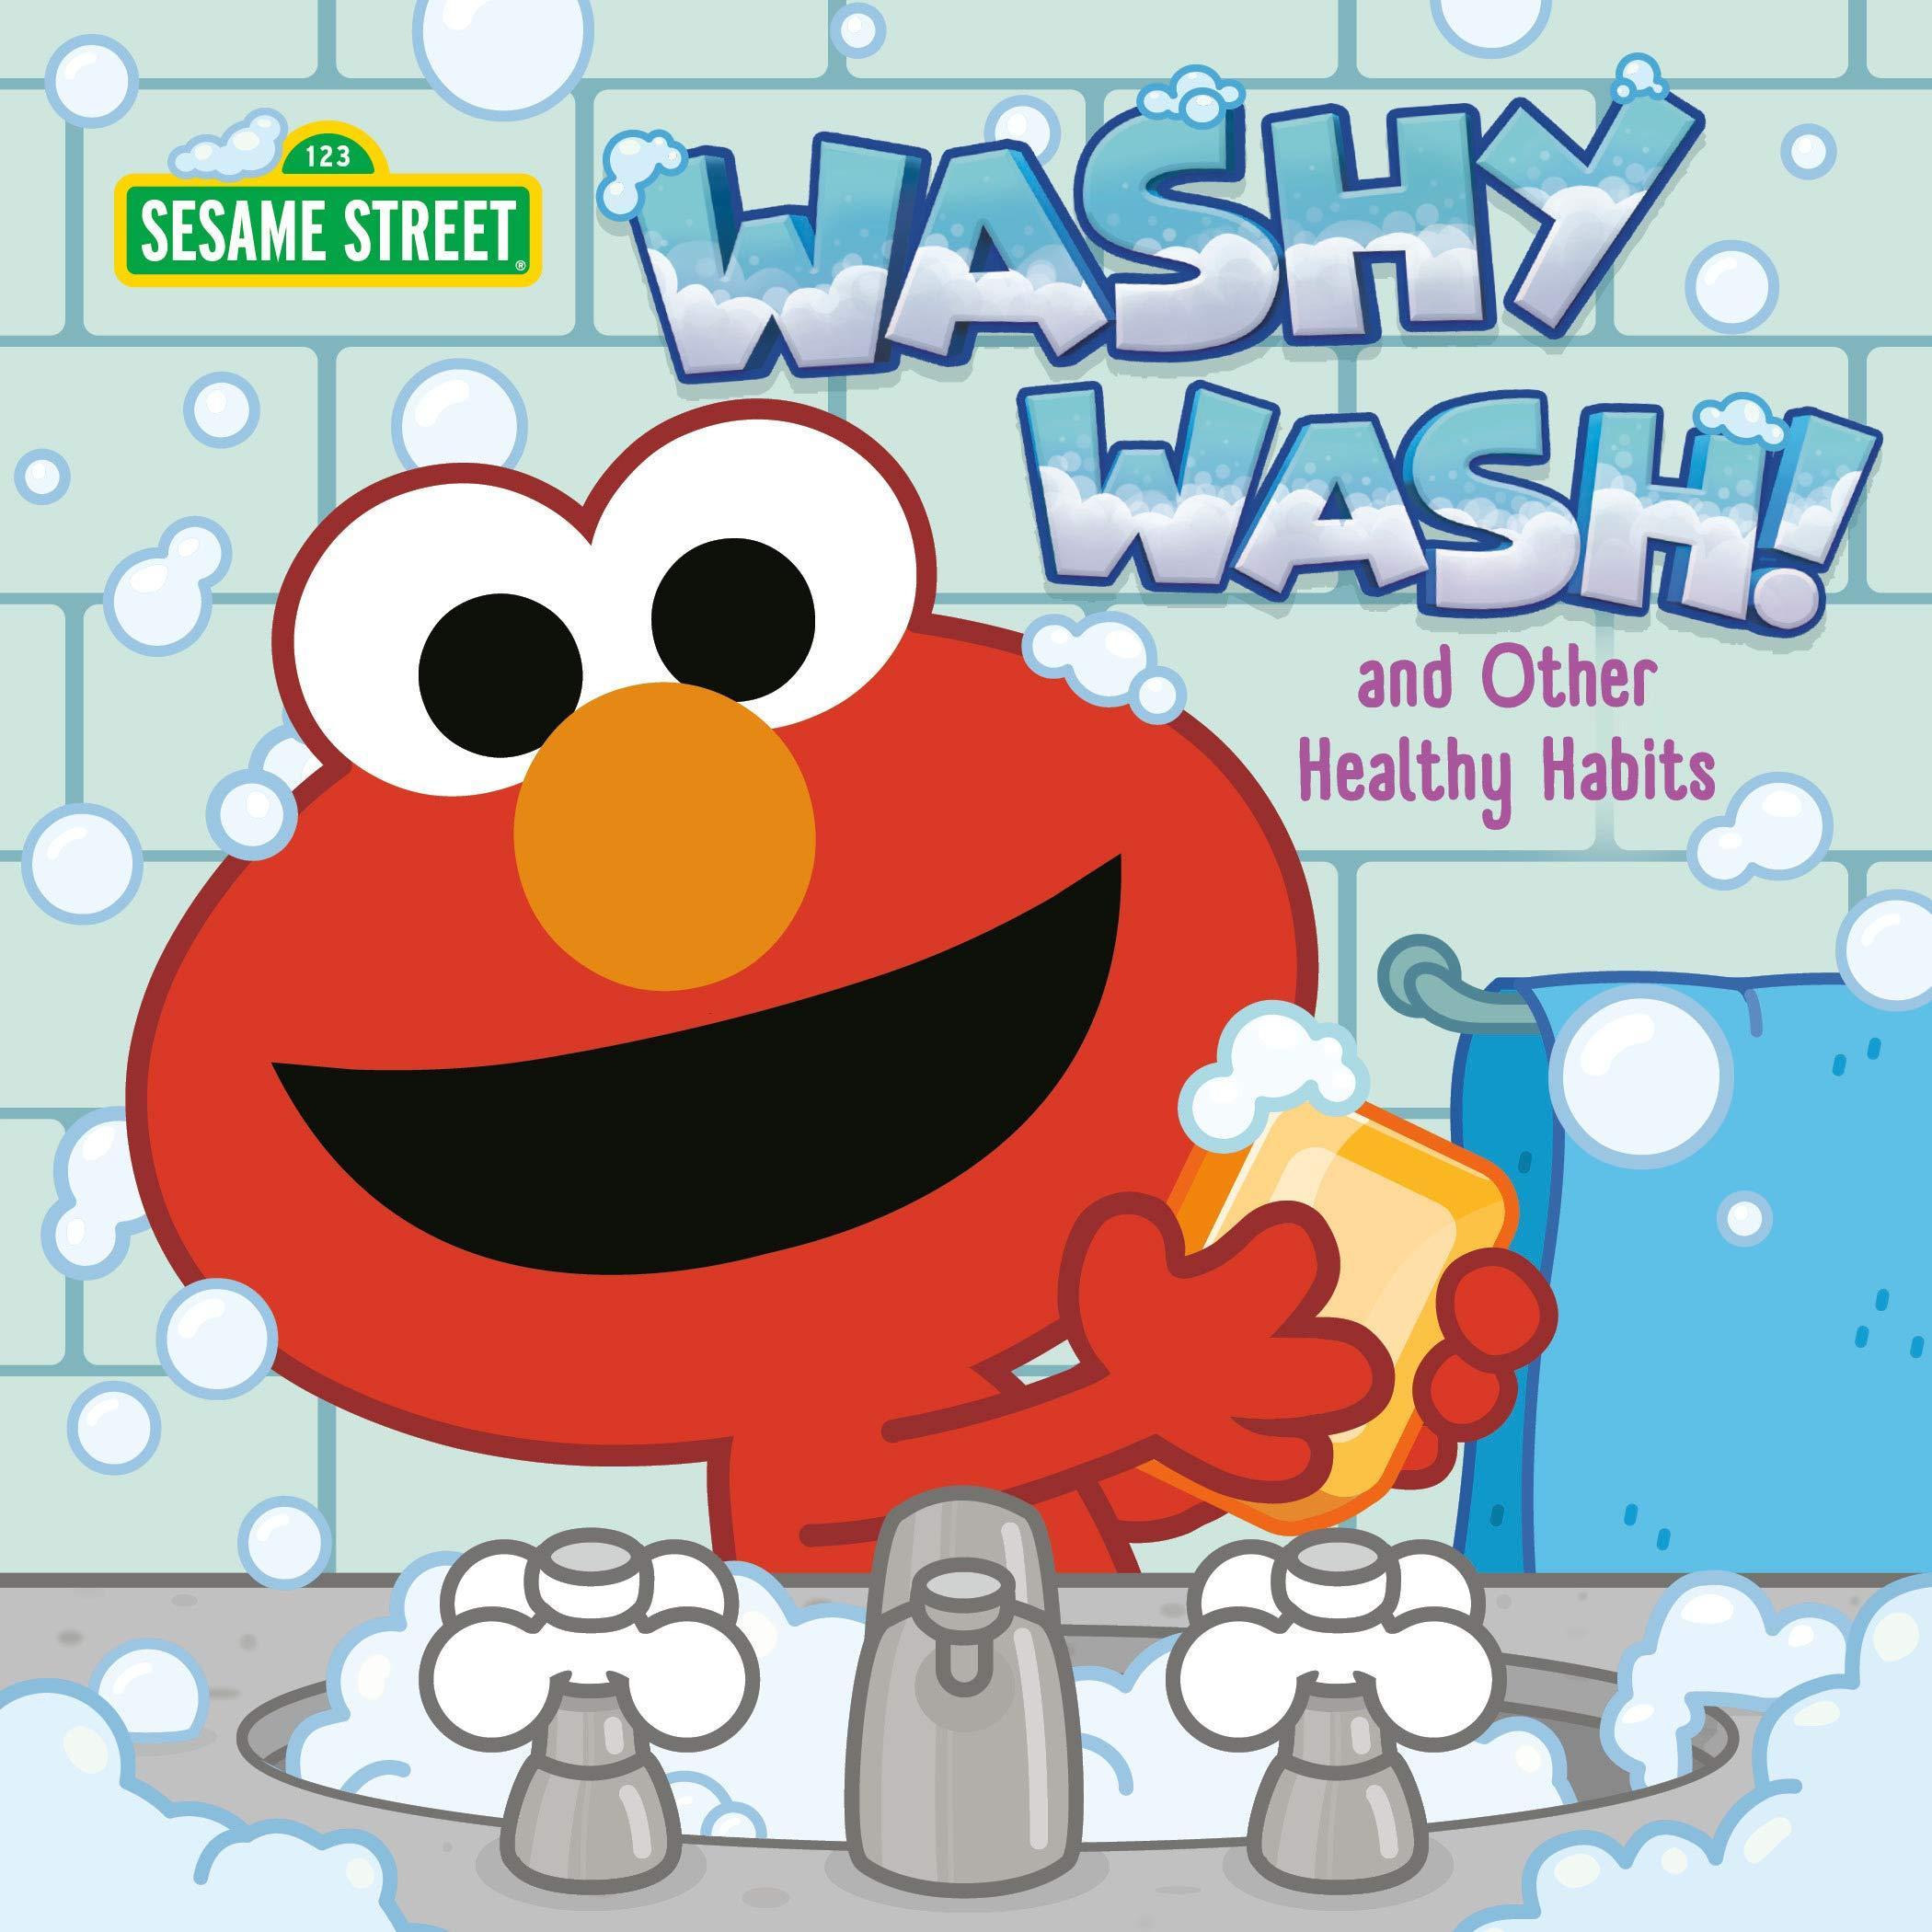 Washy wash! and other healthy habits